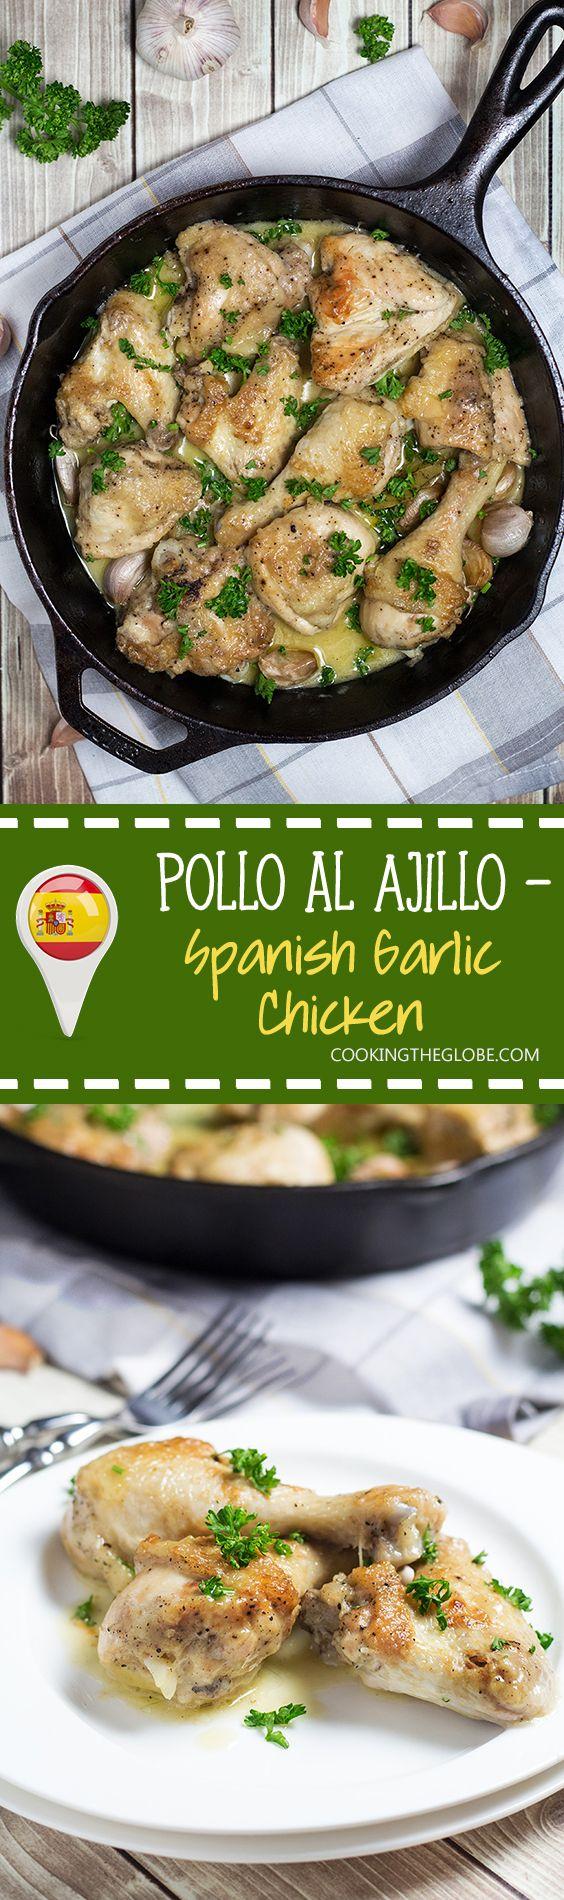 Pollo al Ajillo is a Spanish version of garlic chicken. This recipe requires only 7 ingredients to make!   cookingtheglobe.com